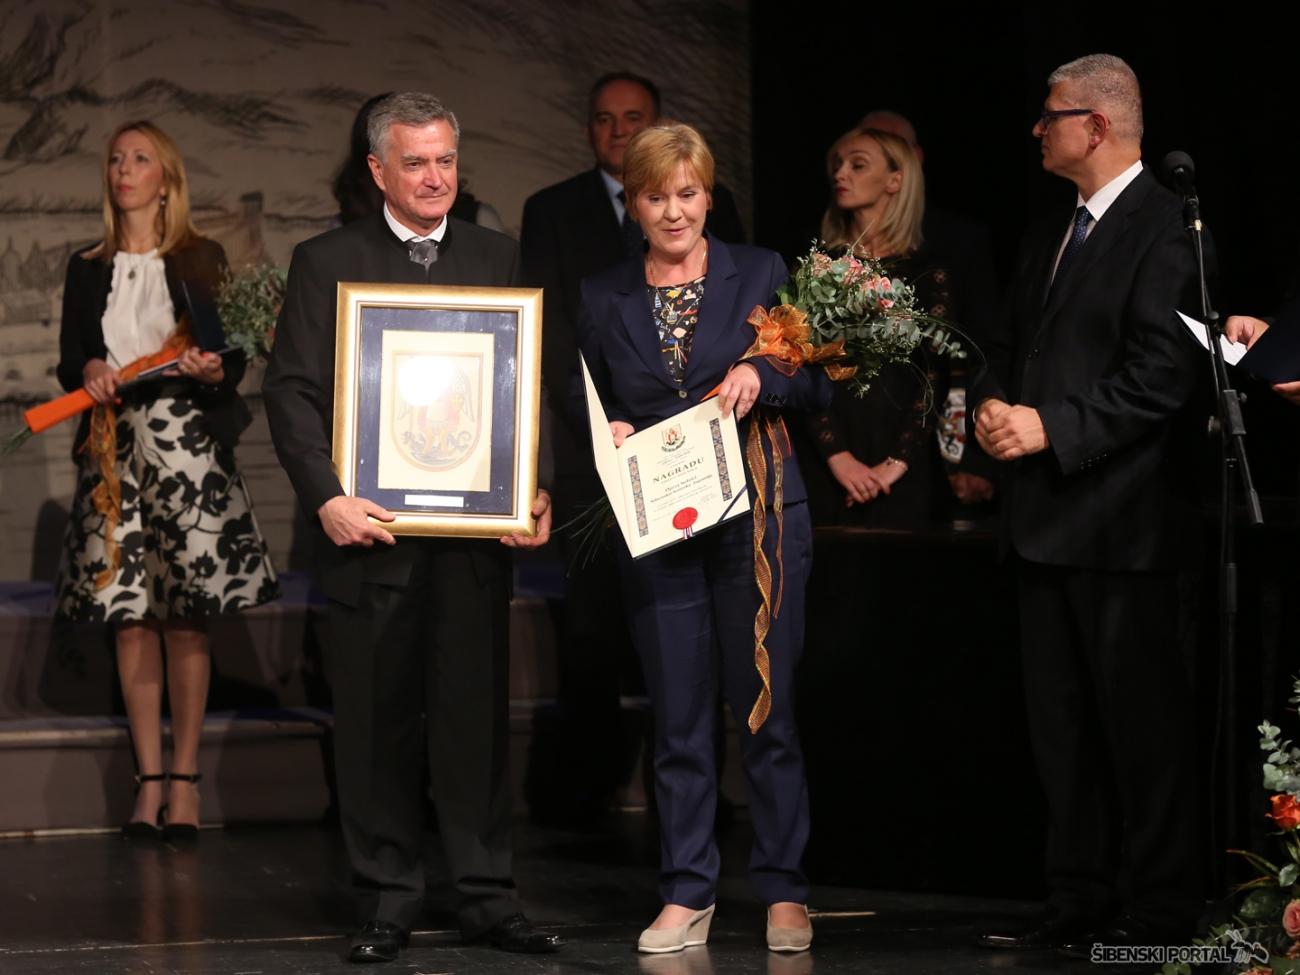 nagrada grada sibenika 280917 11